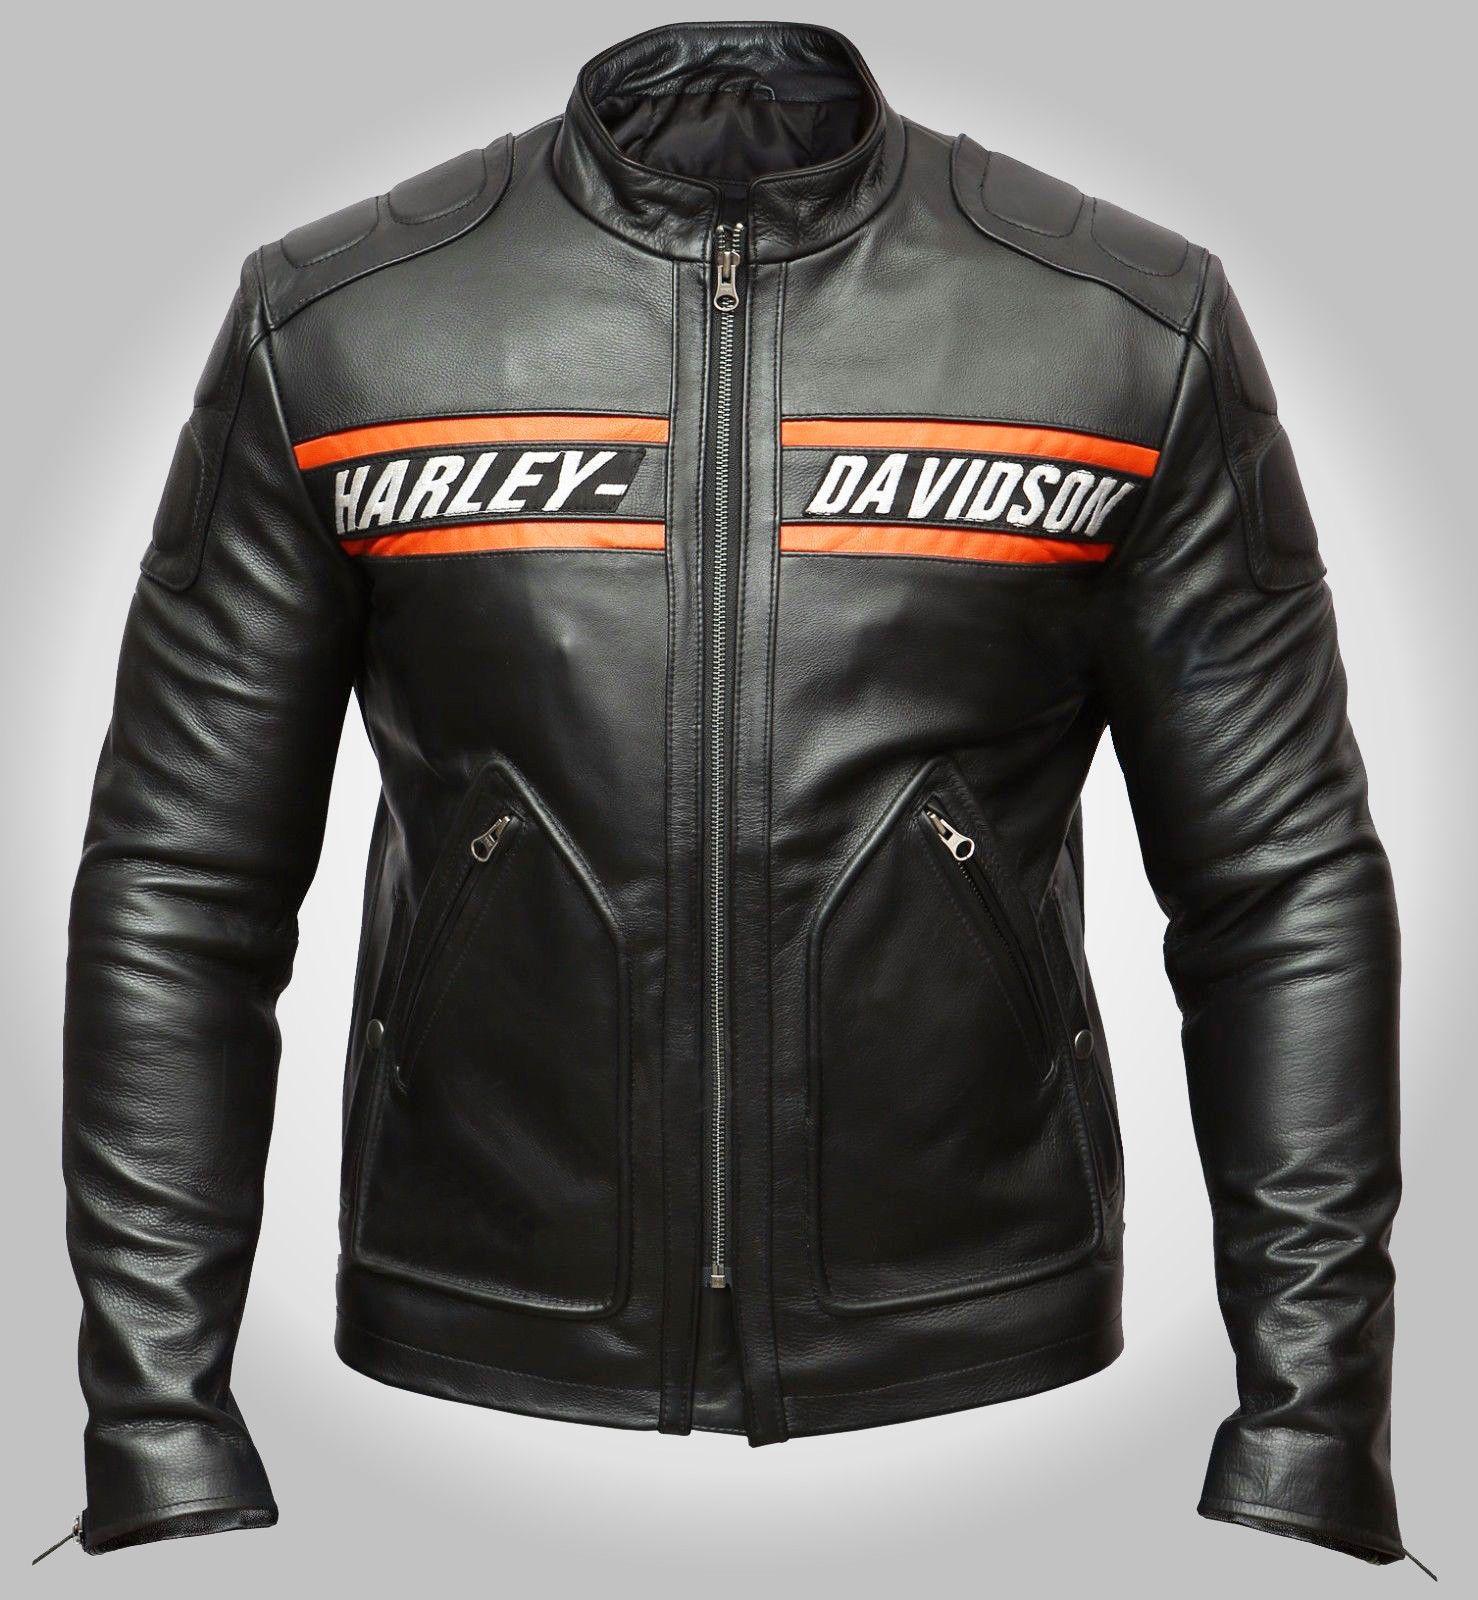 Harley Davidson Biker Genuine Leather Jacket Style Motorcycle Goldberg Wwe Leather Jacket Men Cafe Racer Leather Jacket Harley Davidson Leather Jackets [ 1600 x 1478 Pixel ]